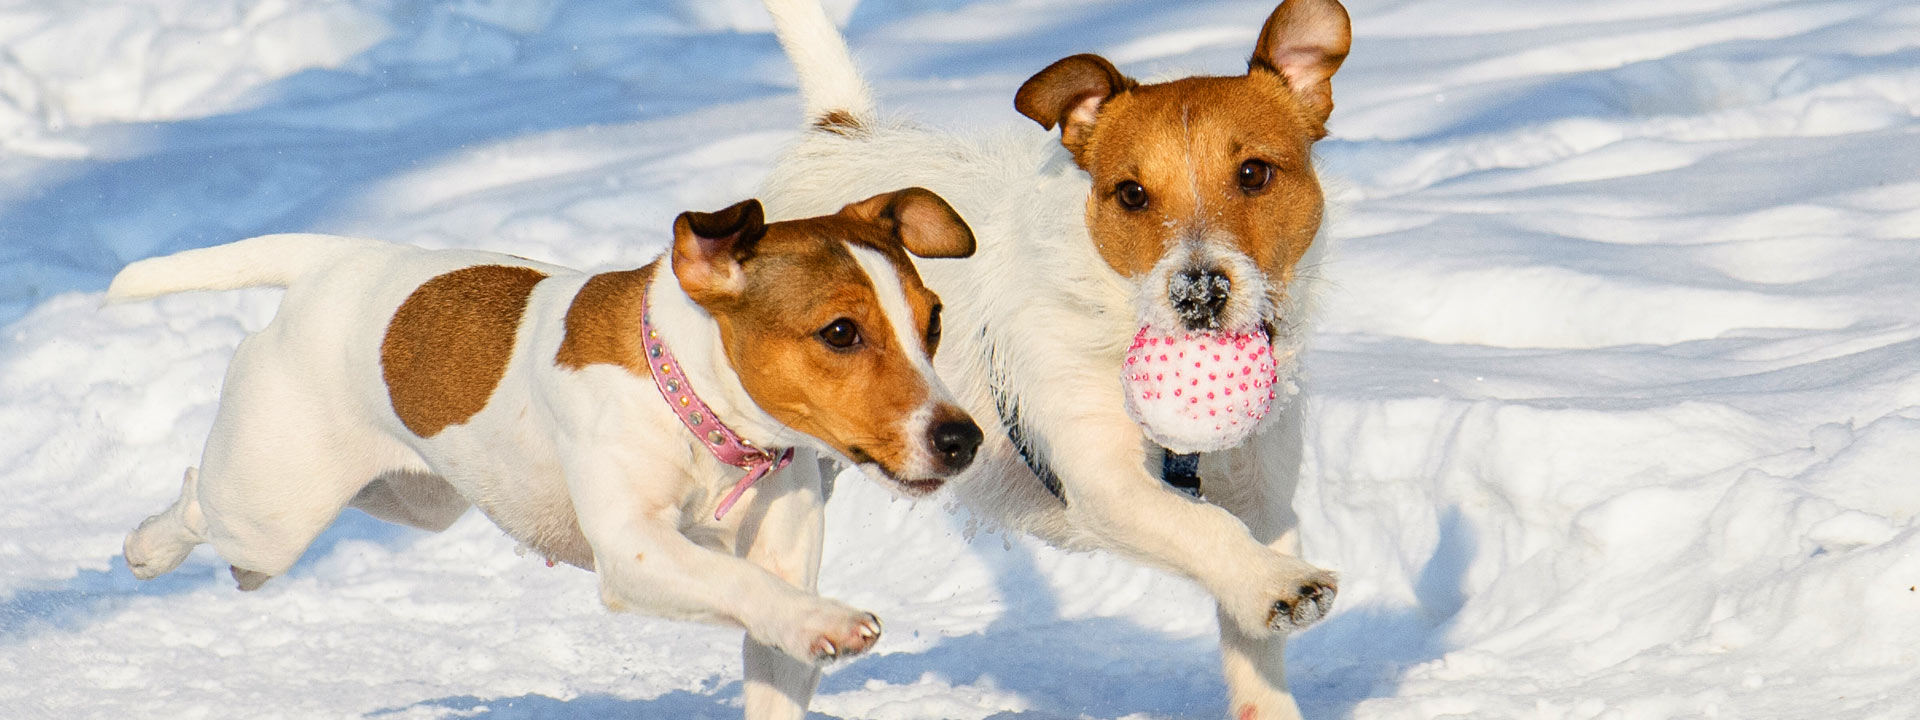 skiurlaub-mit-hund